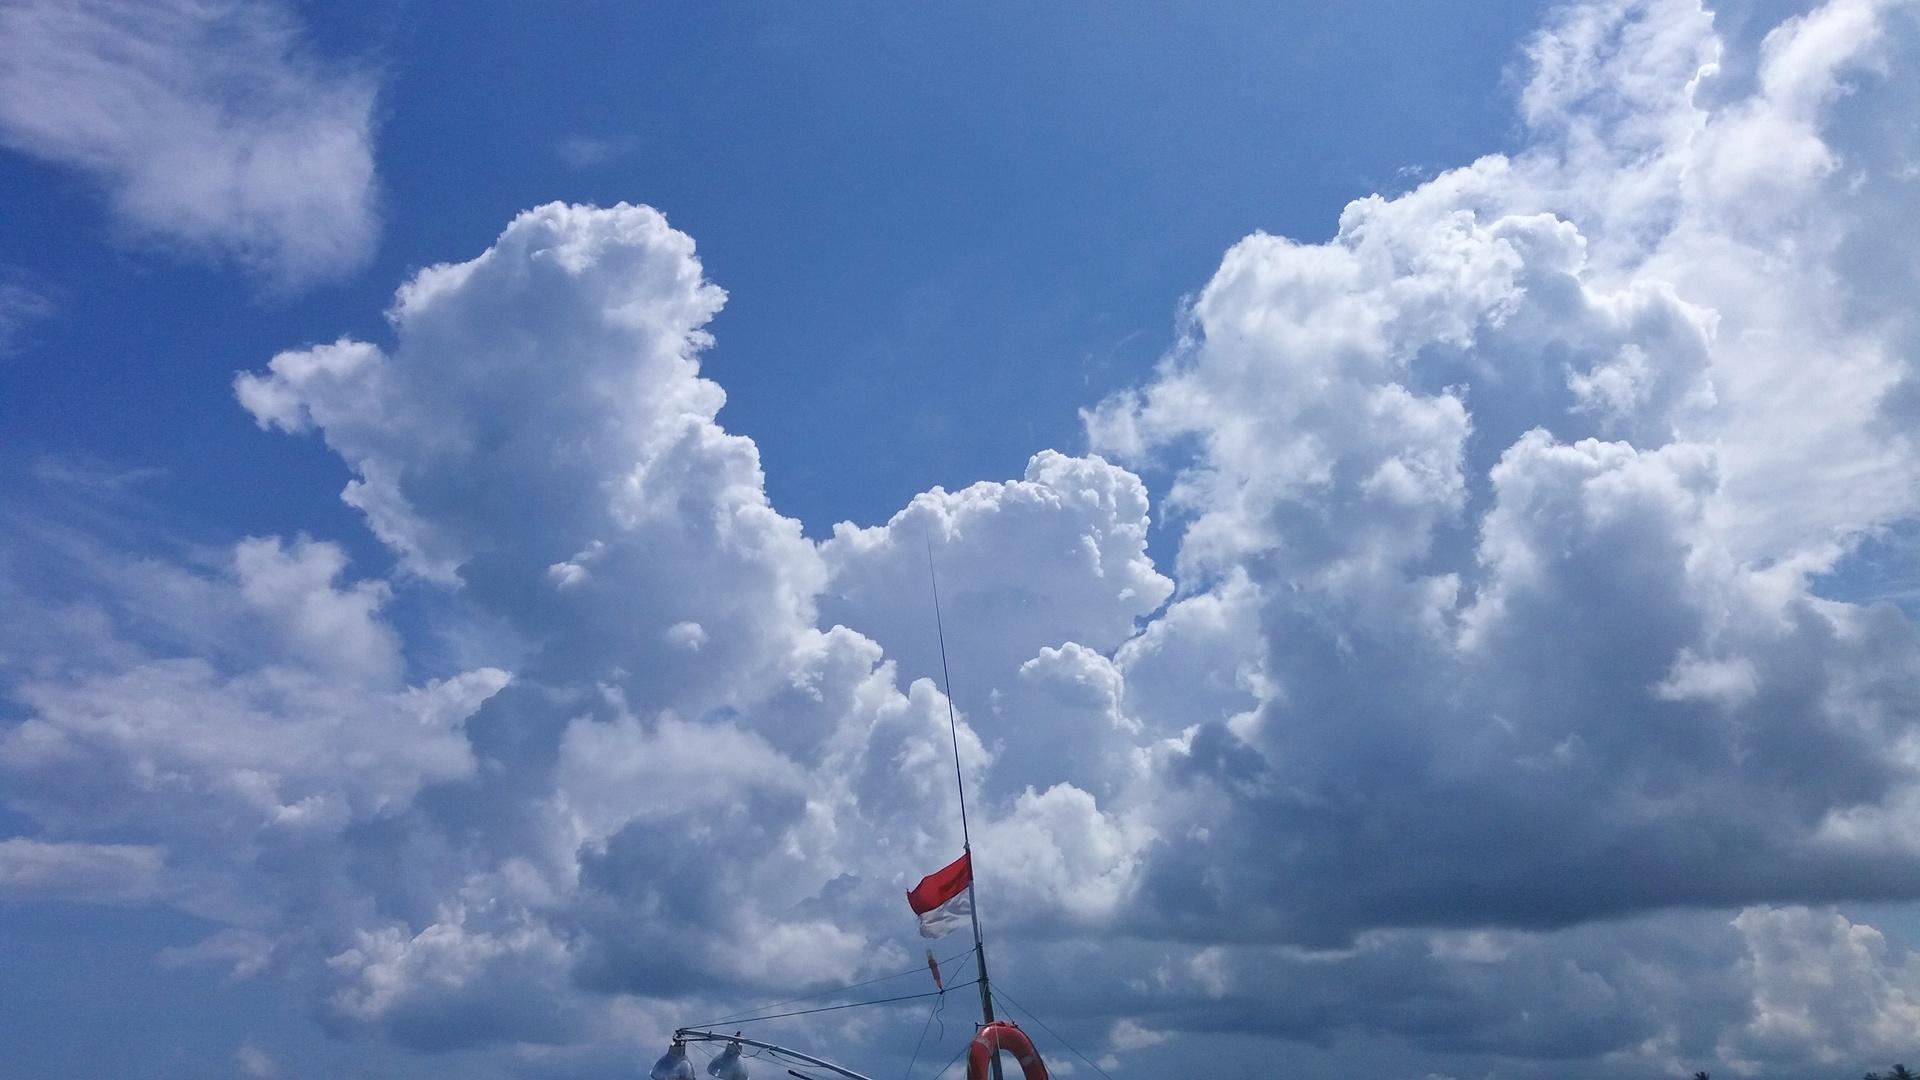 blue sky white clouds | cahyo05, no person, landscape, cloud